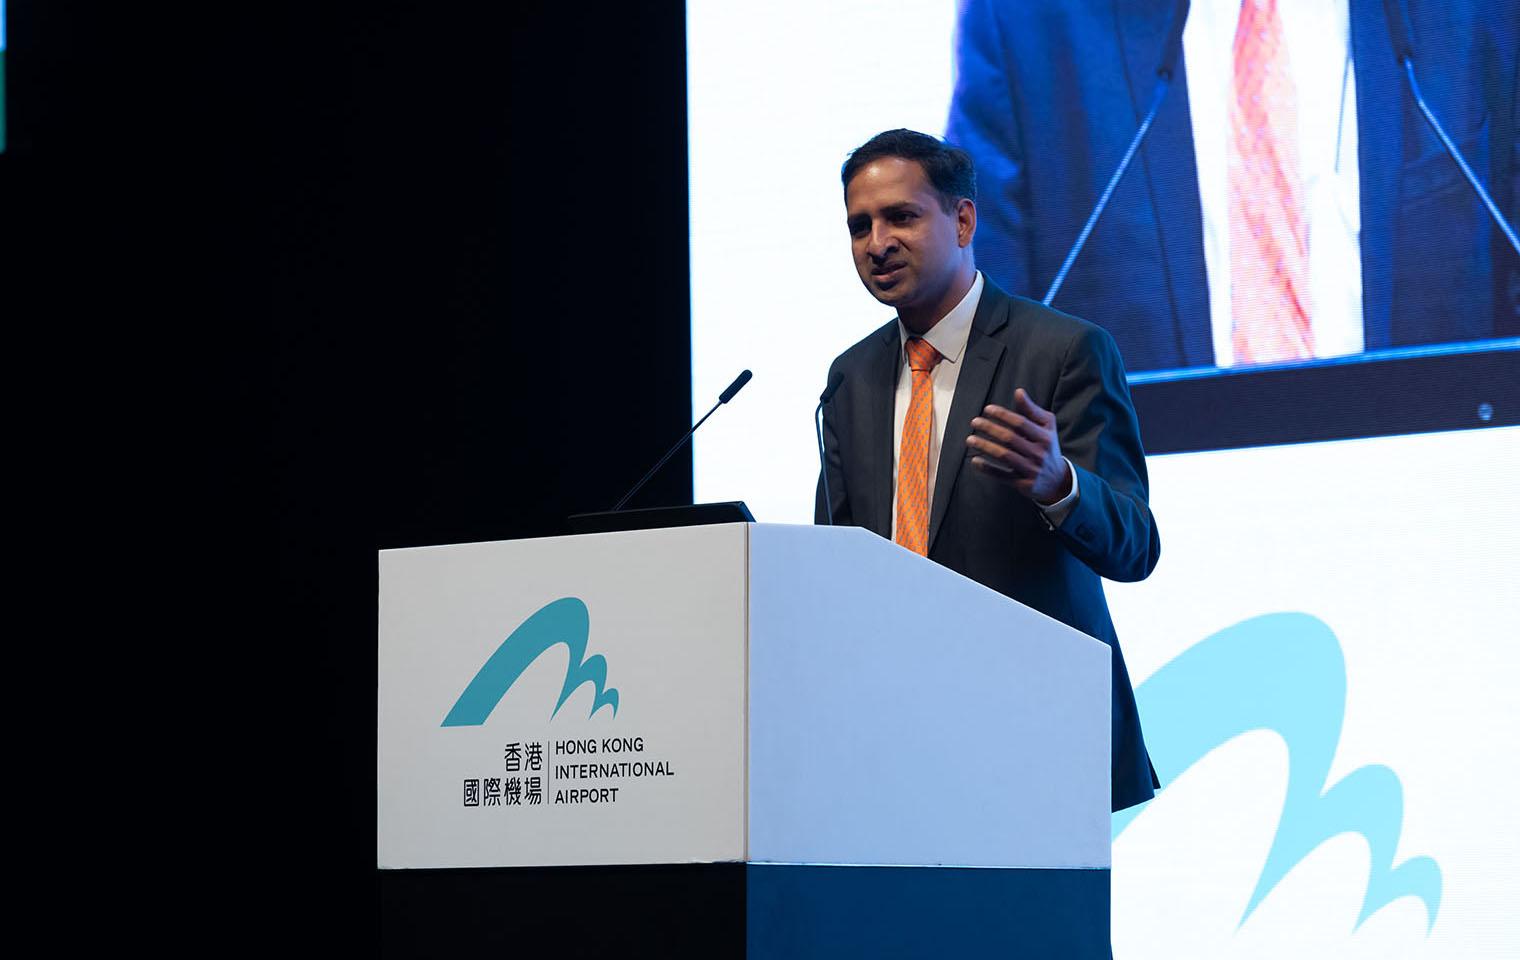 <strong>Mr. Sankar .S. Villupuram</strong><br>Hong Kong Internet of Things Alliance